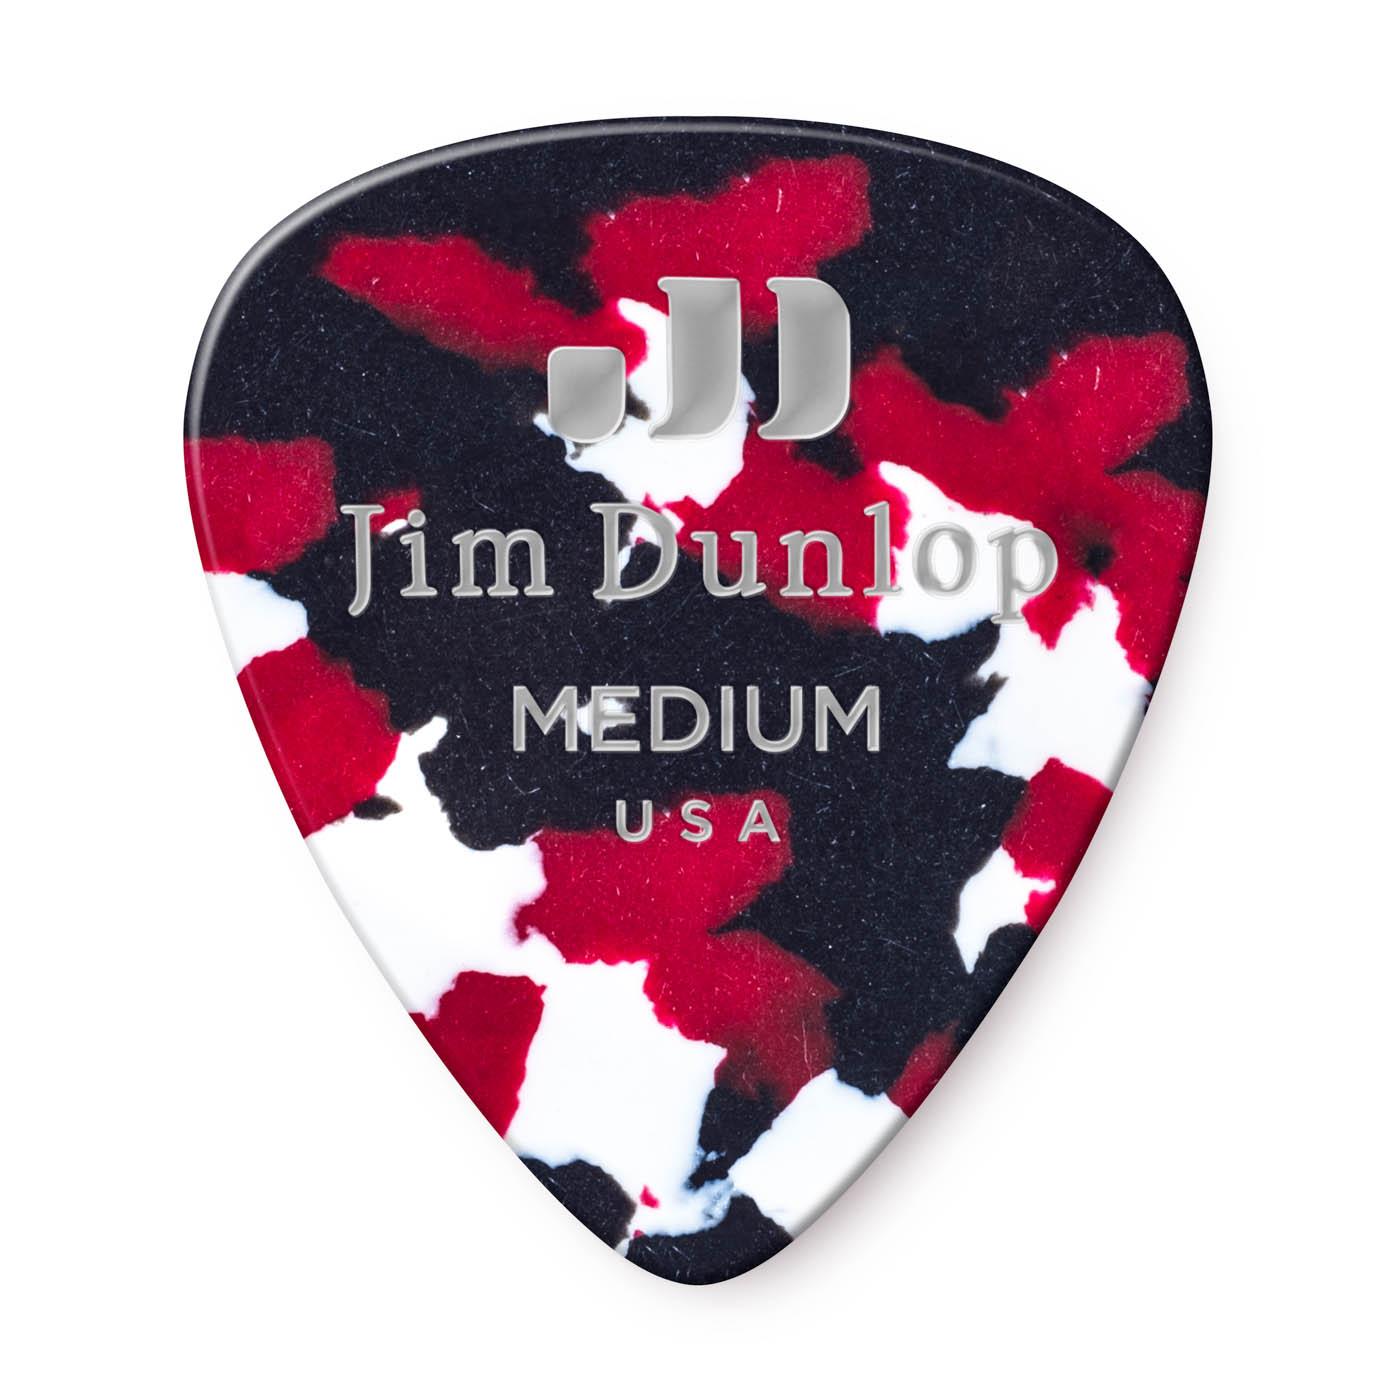 Dunlop - Confetti medium